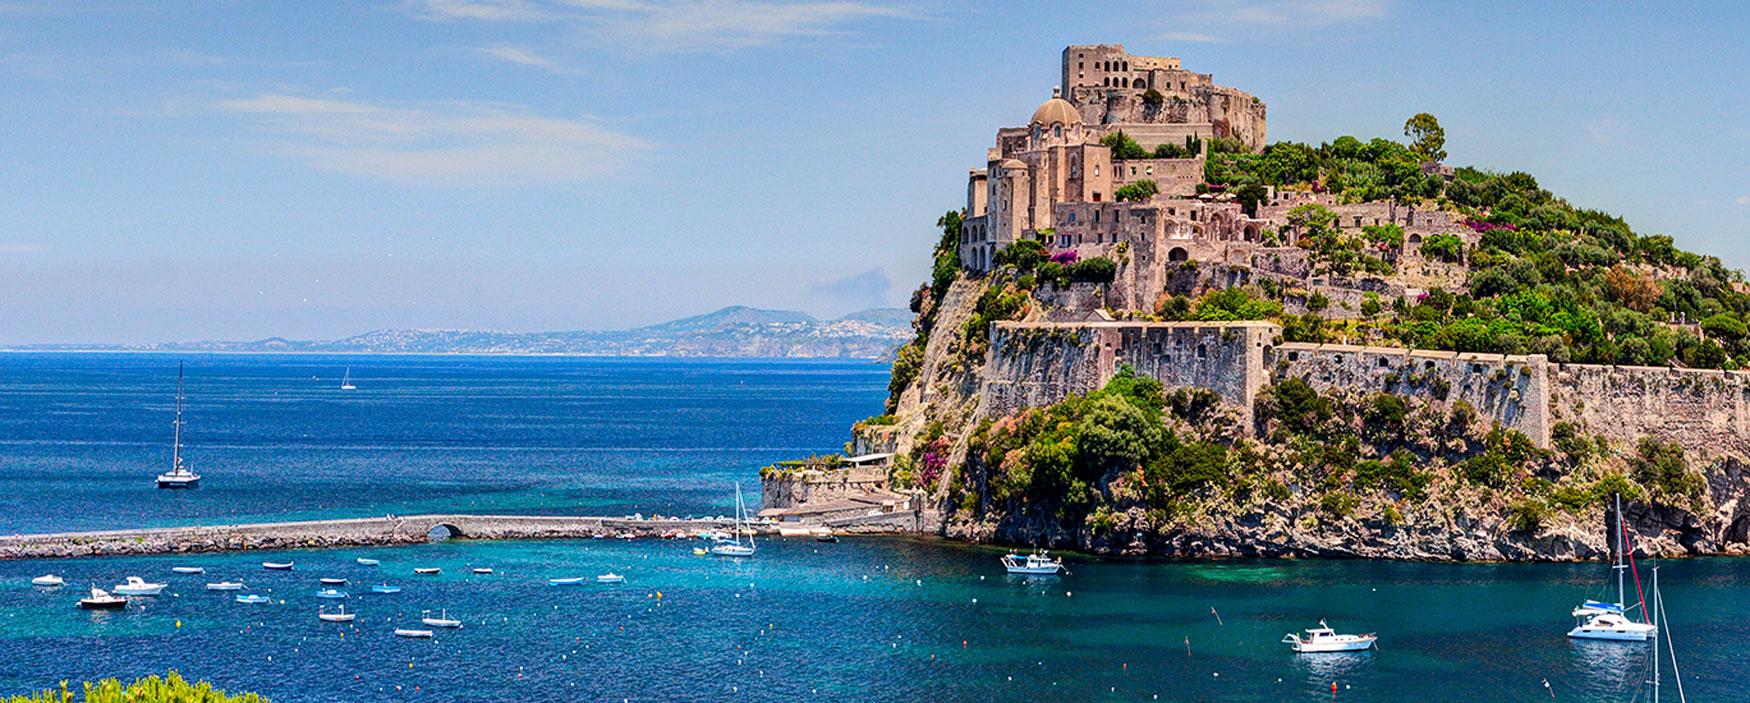 Hotel Ischia: Assistenza Turistica Gratuita